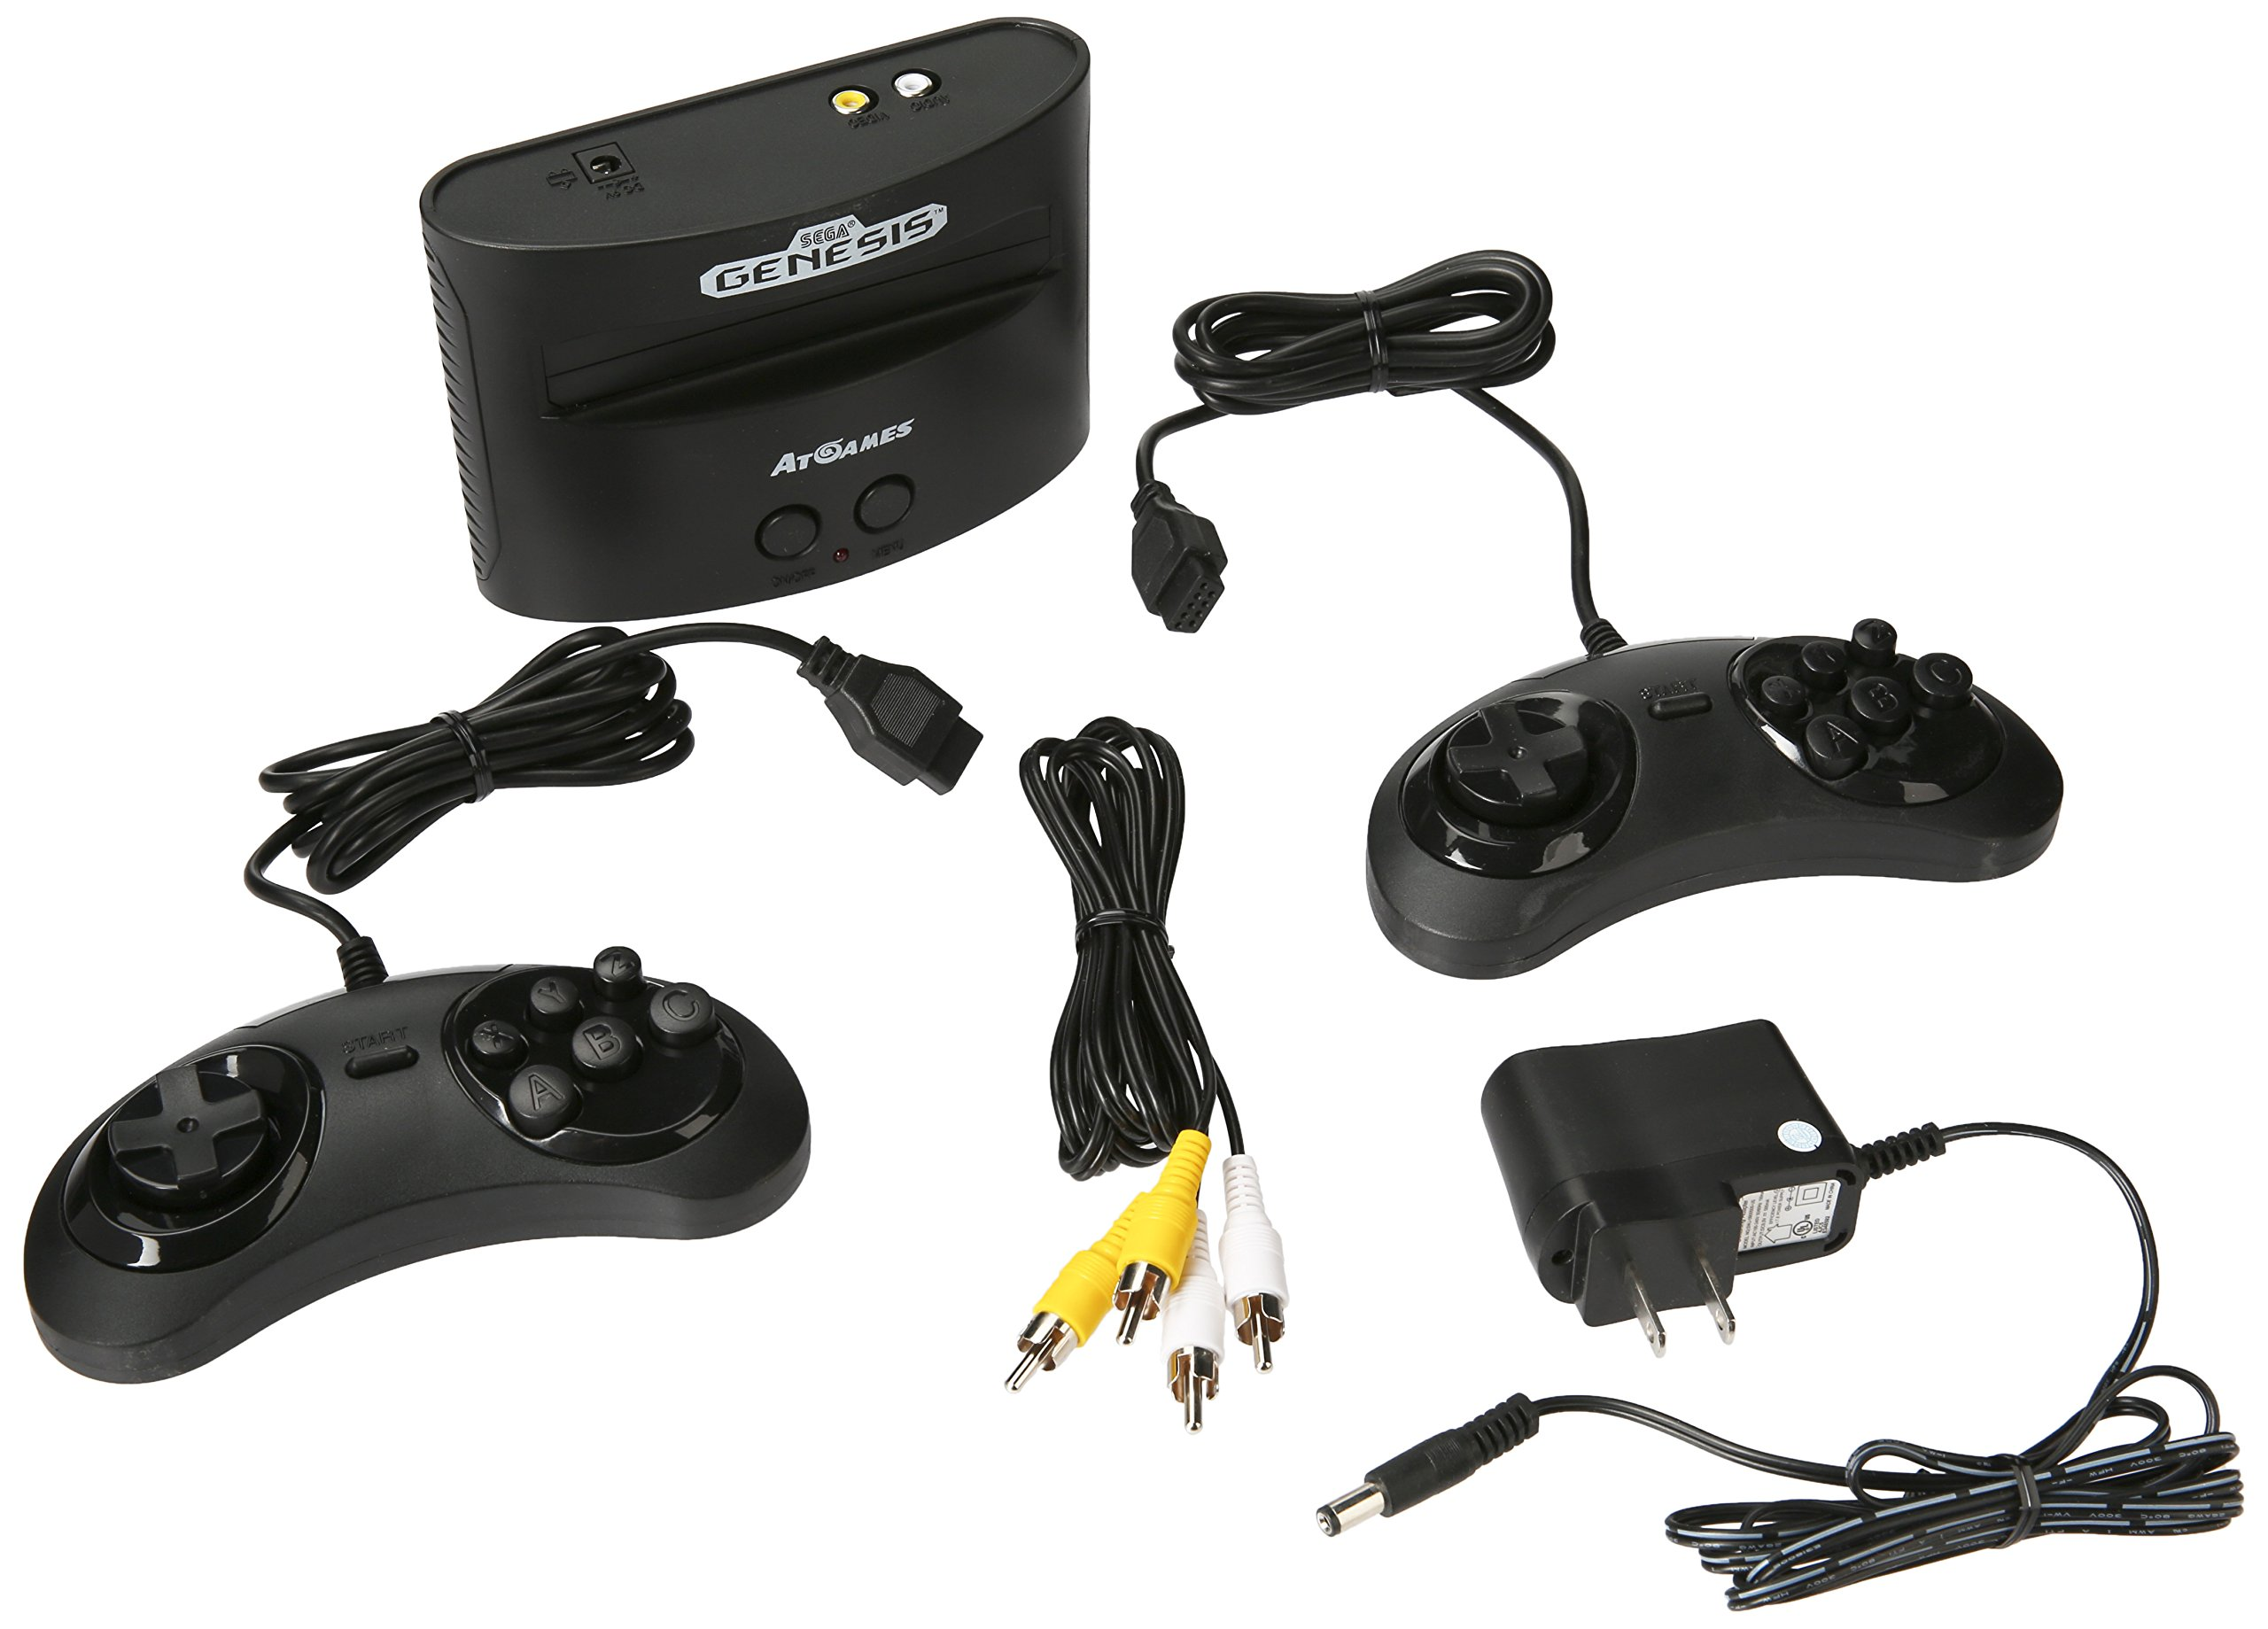 Galleon atgames sega genesis classic game console with - Sega genesis classic game console games ...